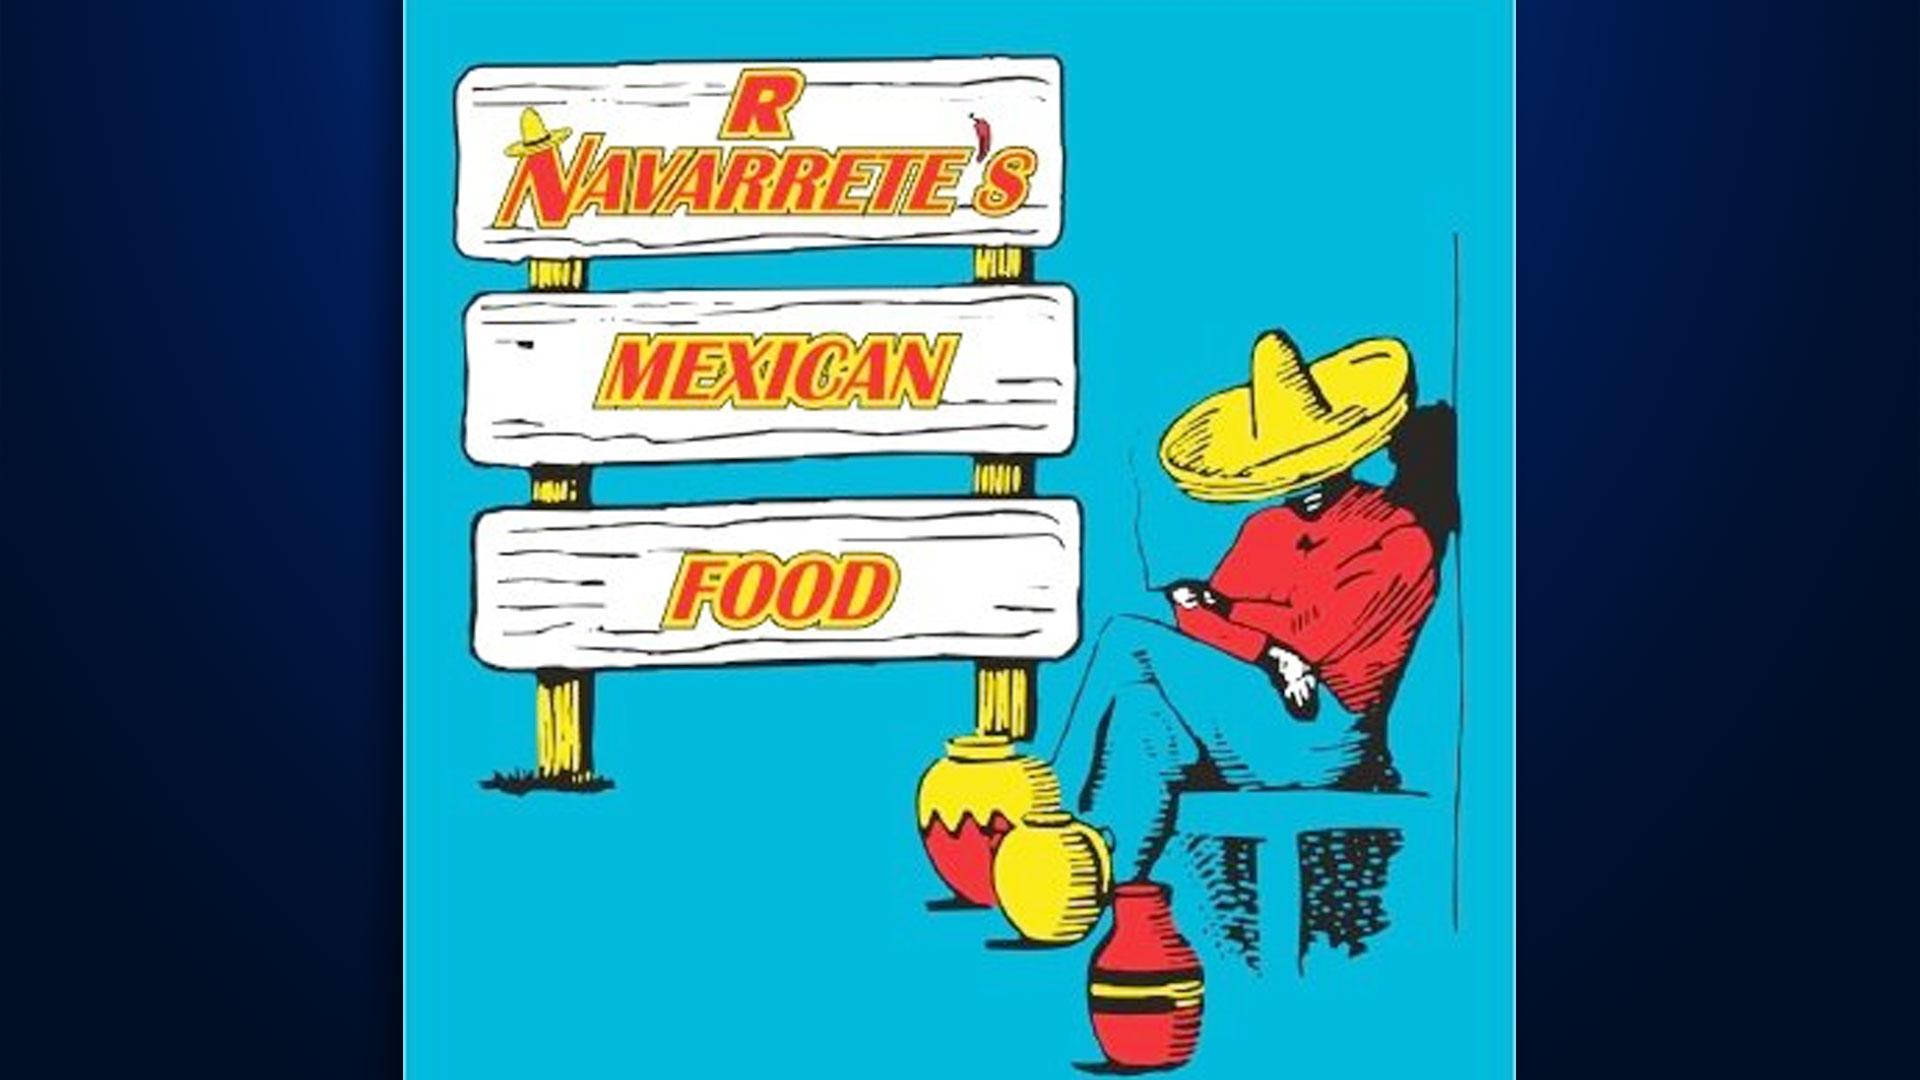 KELO Rudy M. Navarrete's Tex-Mexican Food